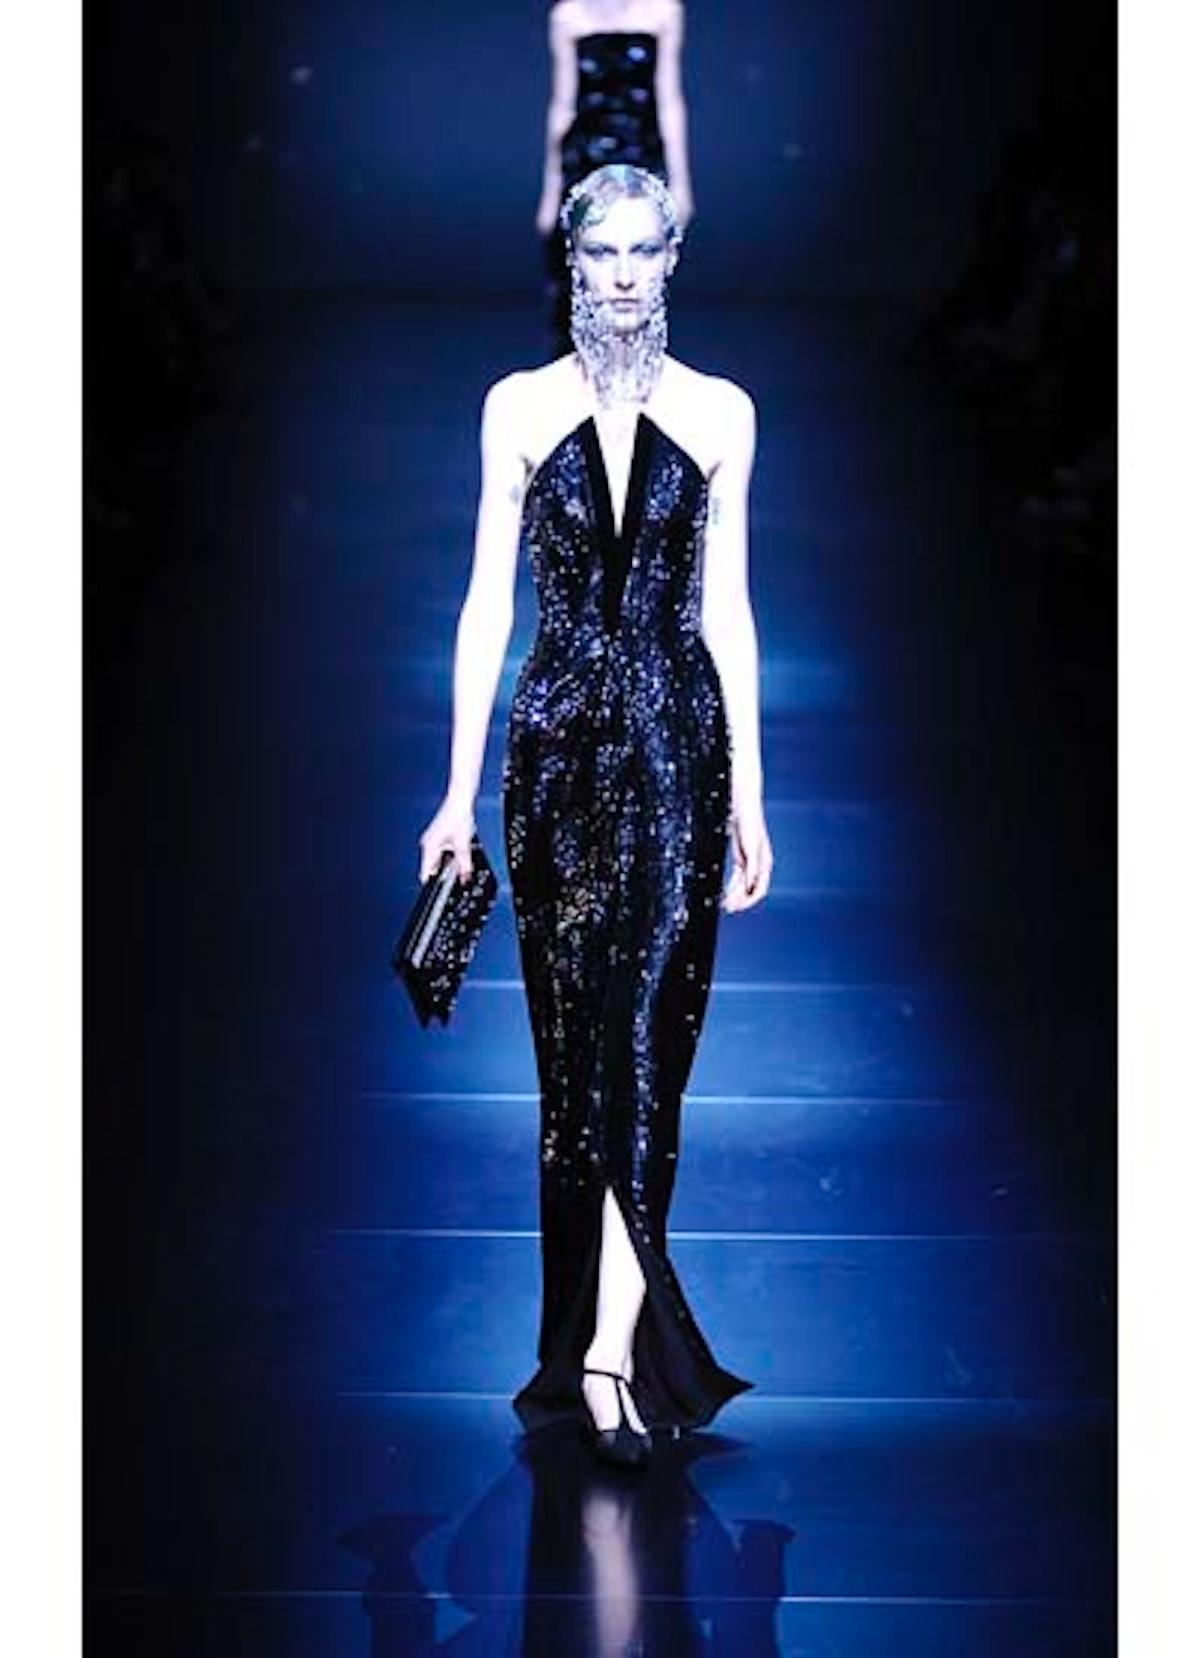 fass-giorgio-armani-couture-2012-runway-50-v.jpg